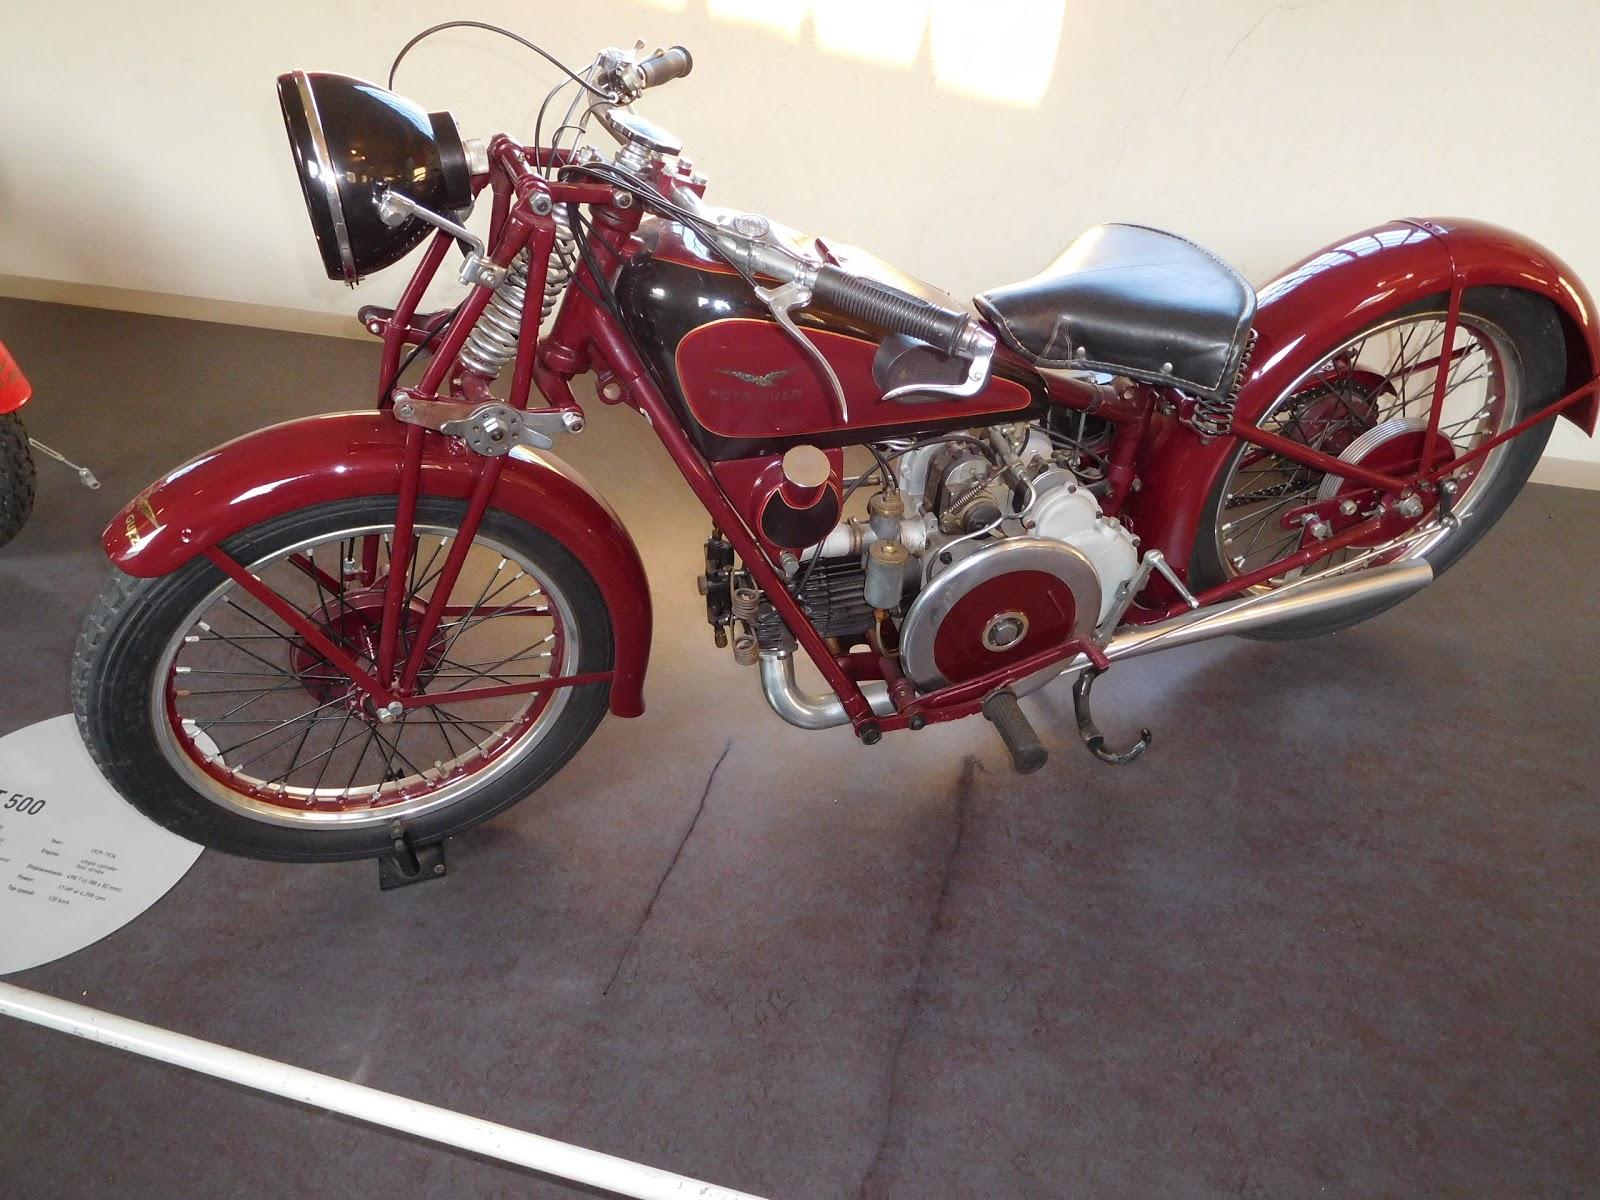 NYDucati: 1929-34 Moto Guzzi 2VT 500